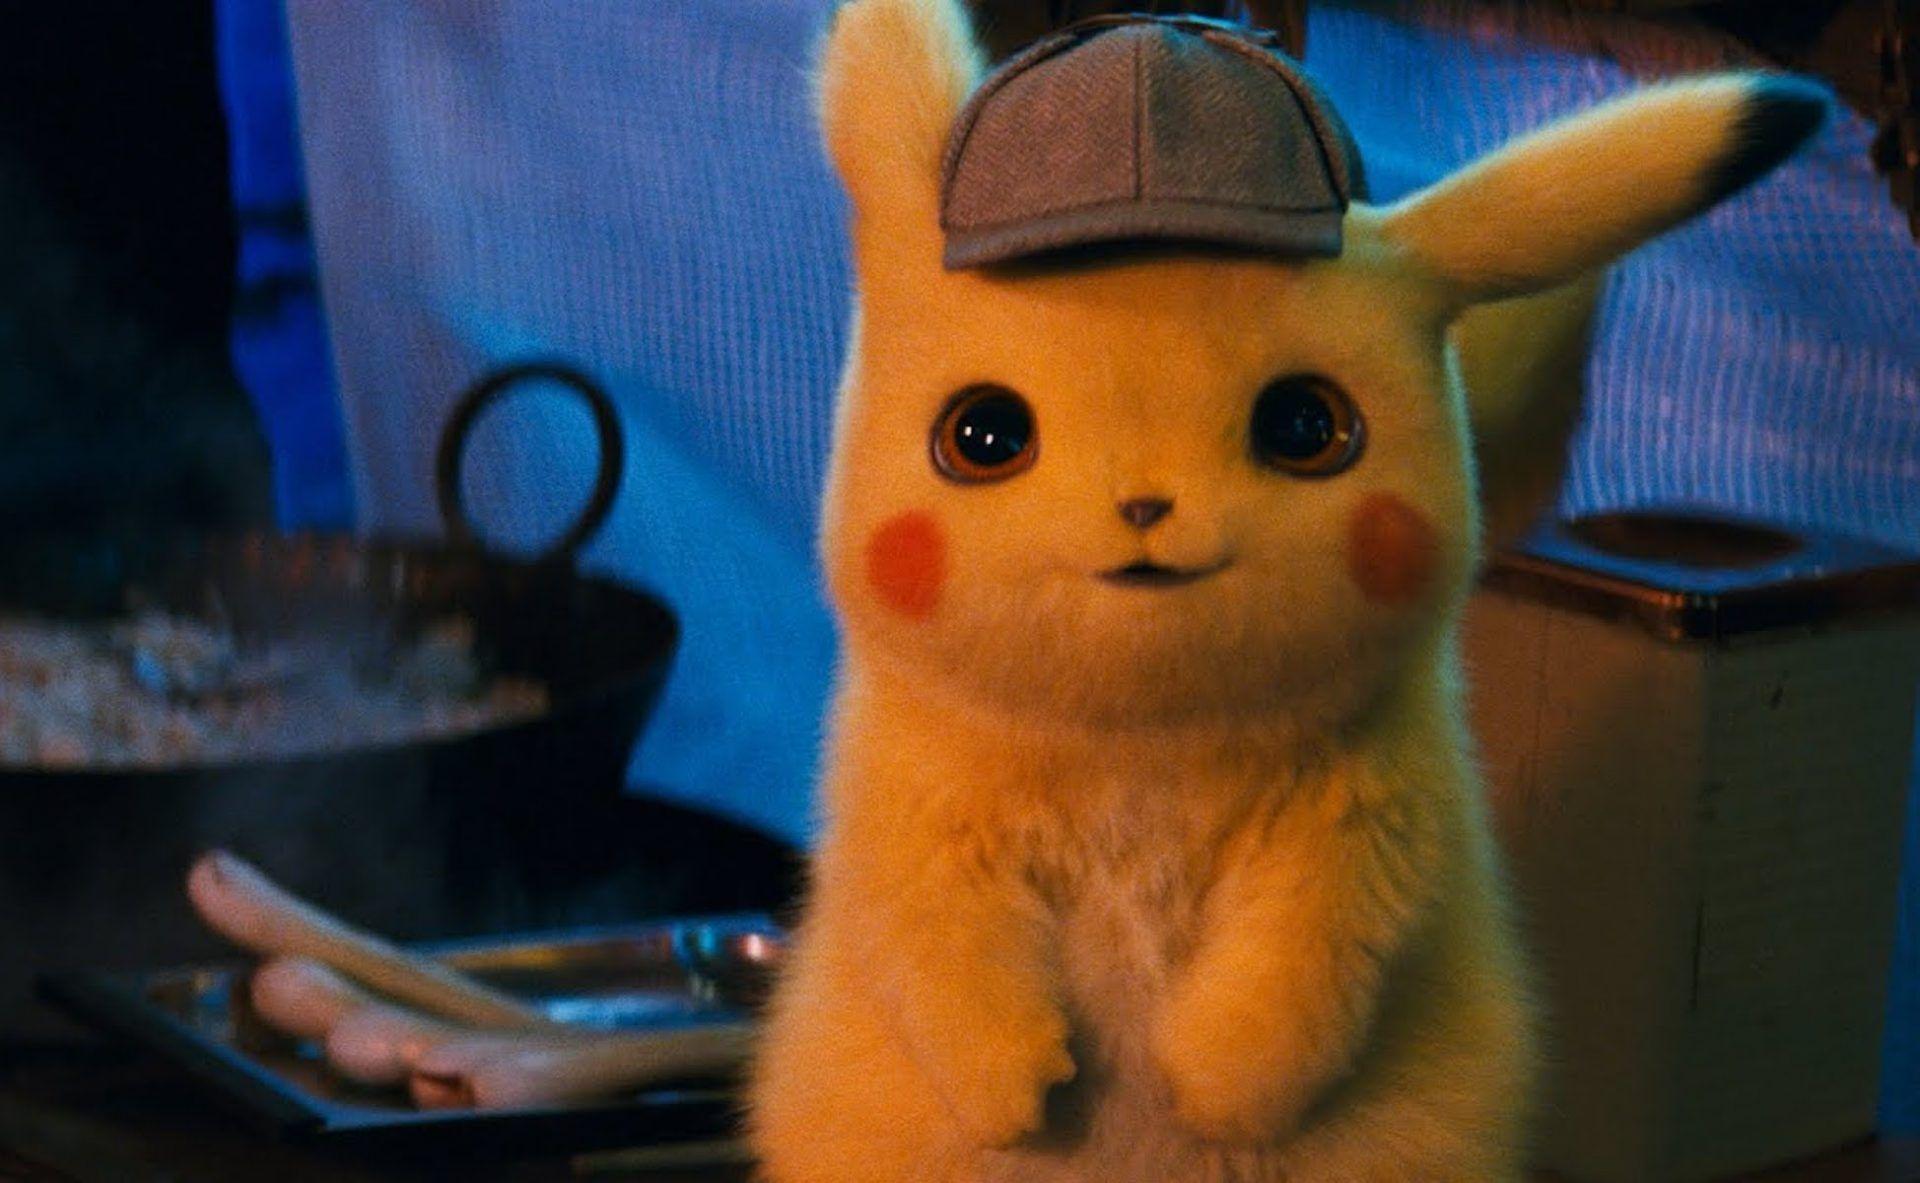 detective_pikachu_film.jpg